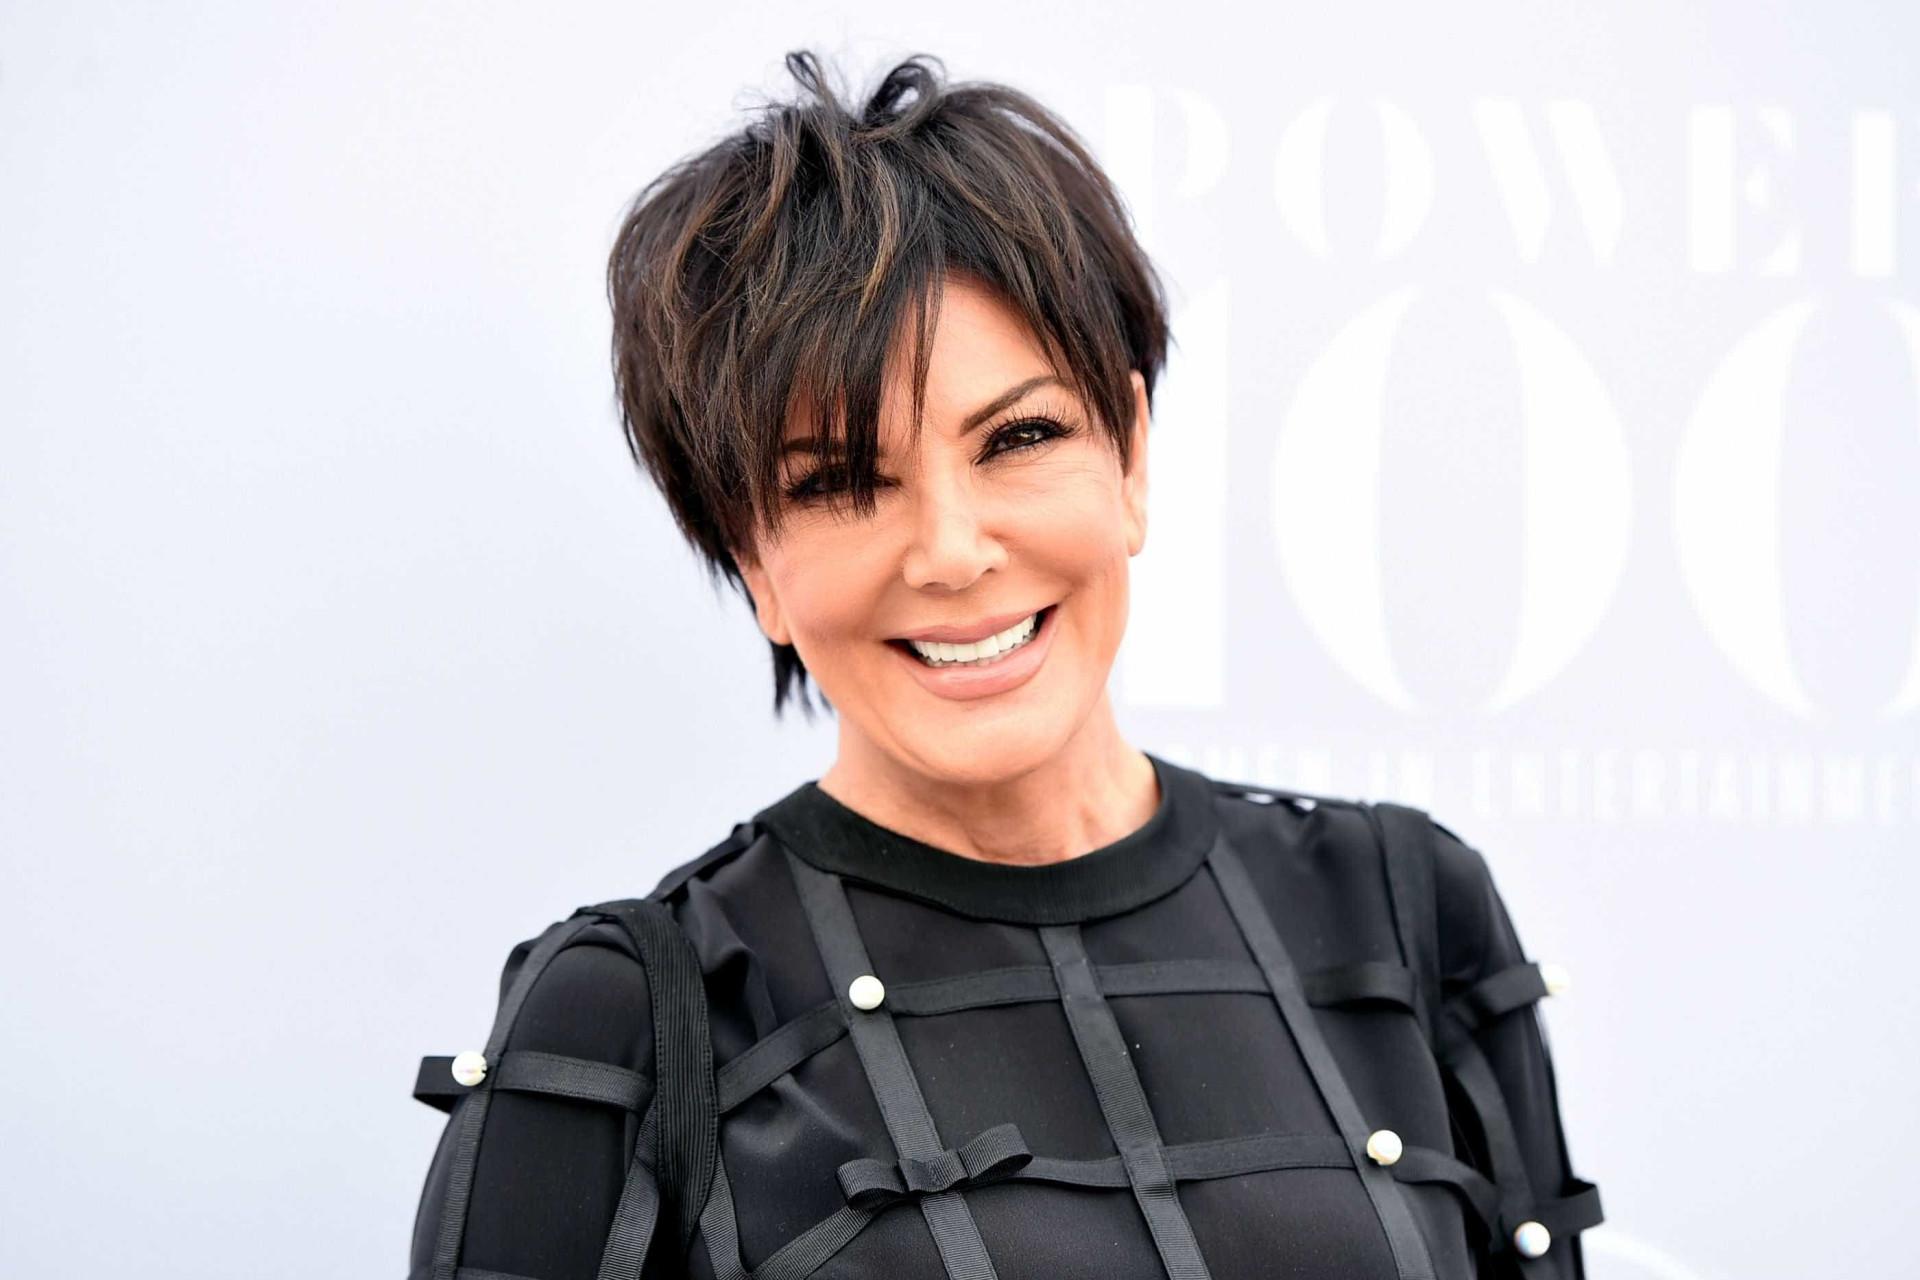 Kris Jenner mostra neta a divertir-se... dentro de lava-loiça